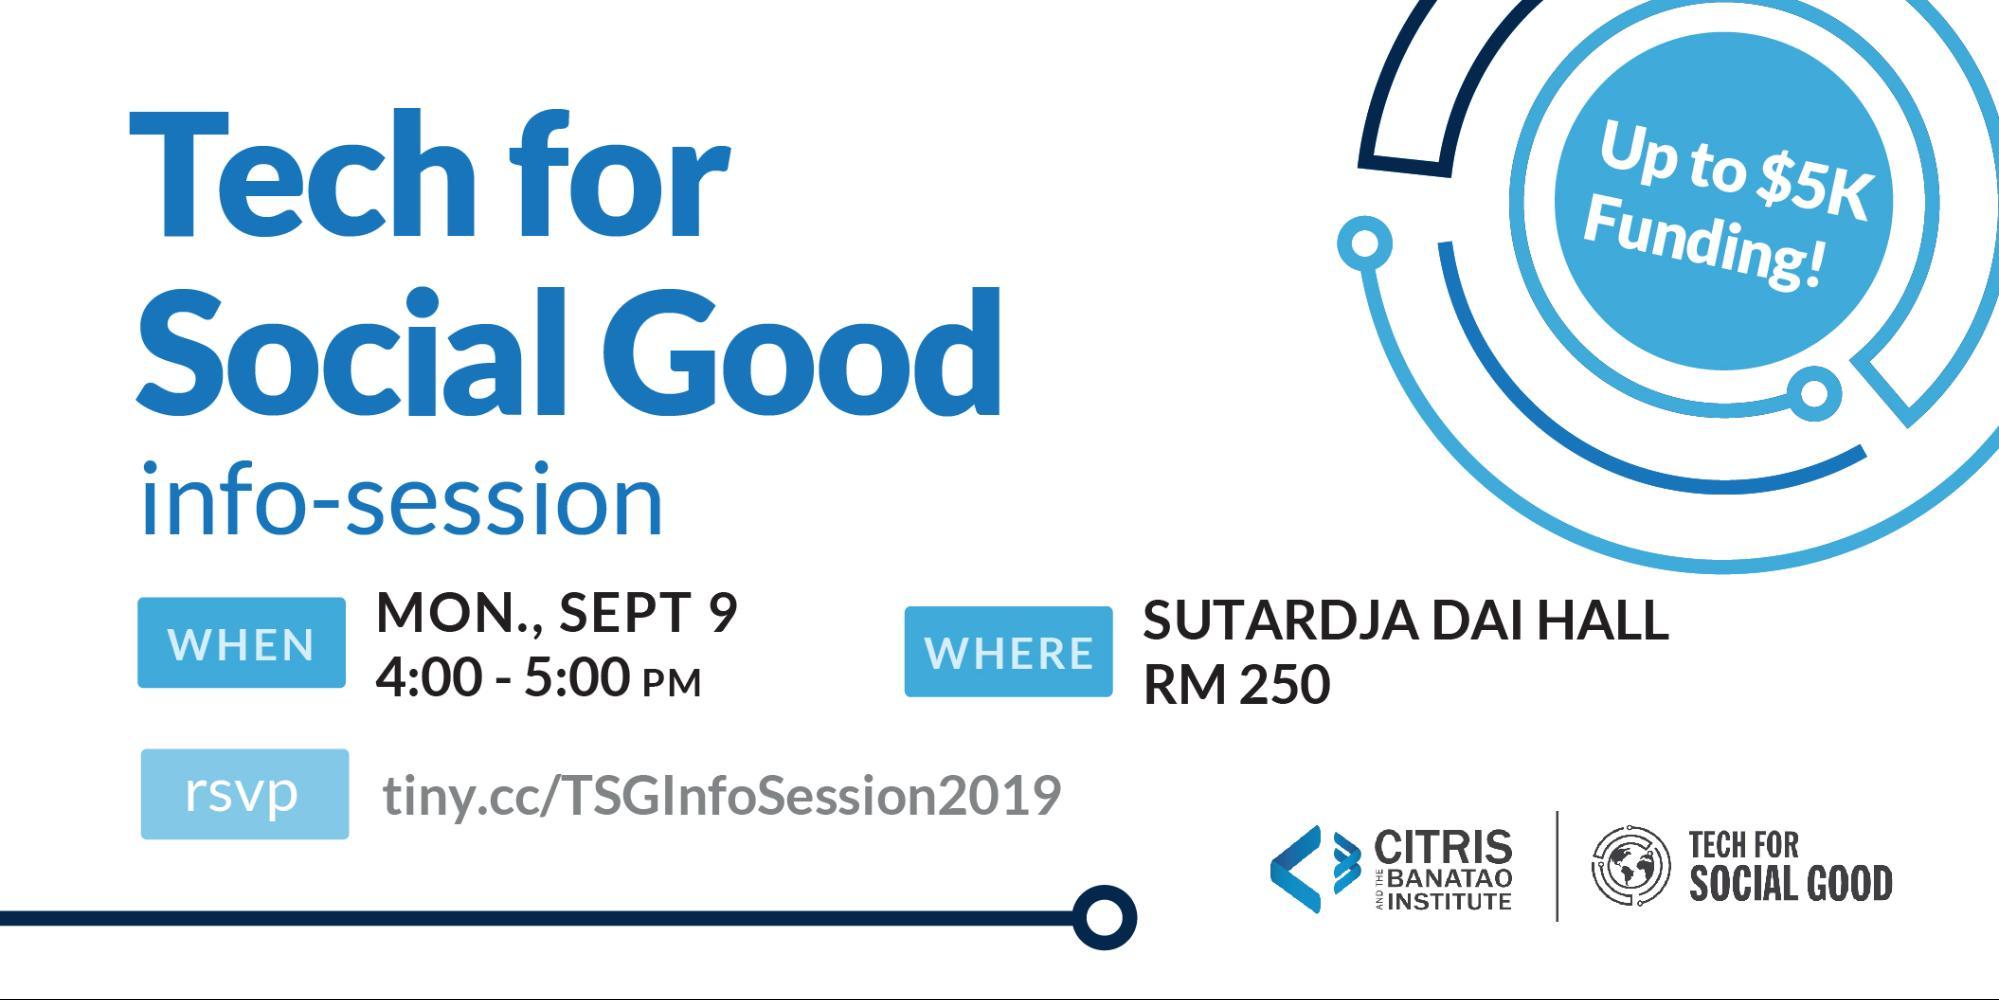 CITRIS Tech for Social Good Info Session